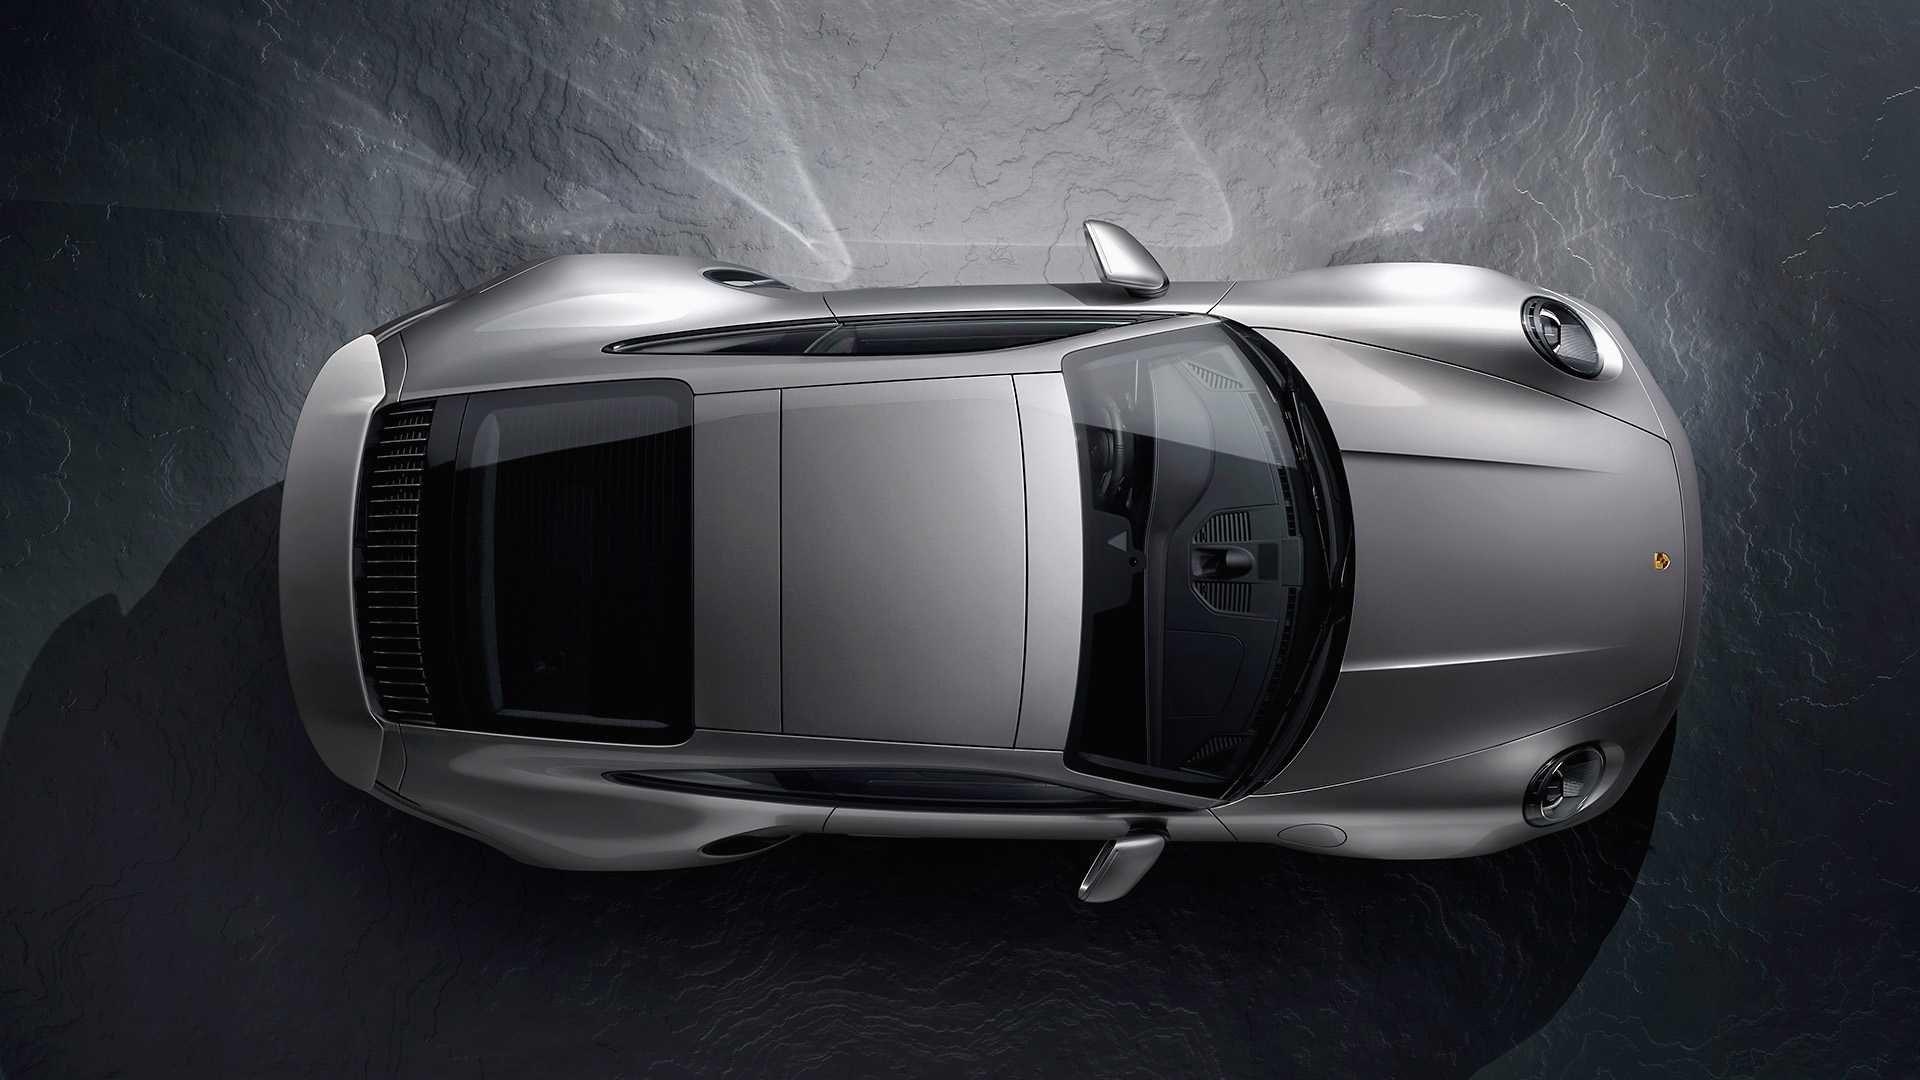 Porsche-911-Turbo-S-2020-4